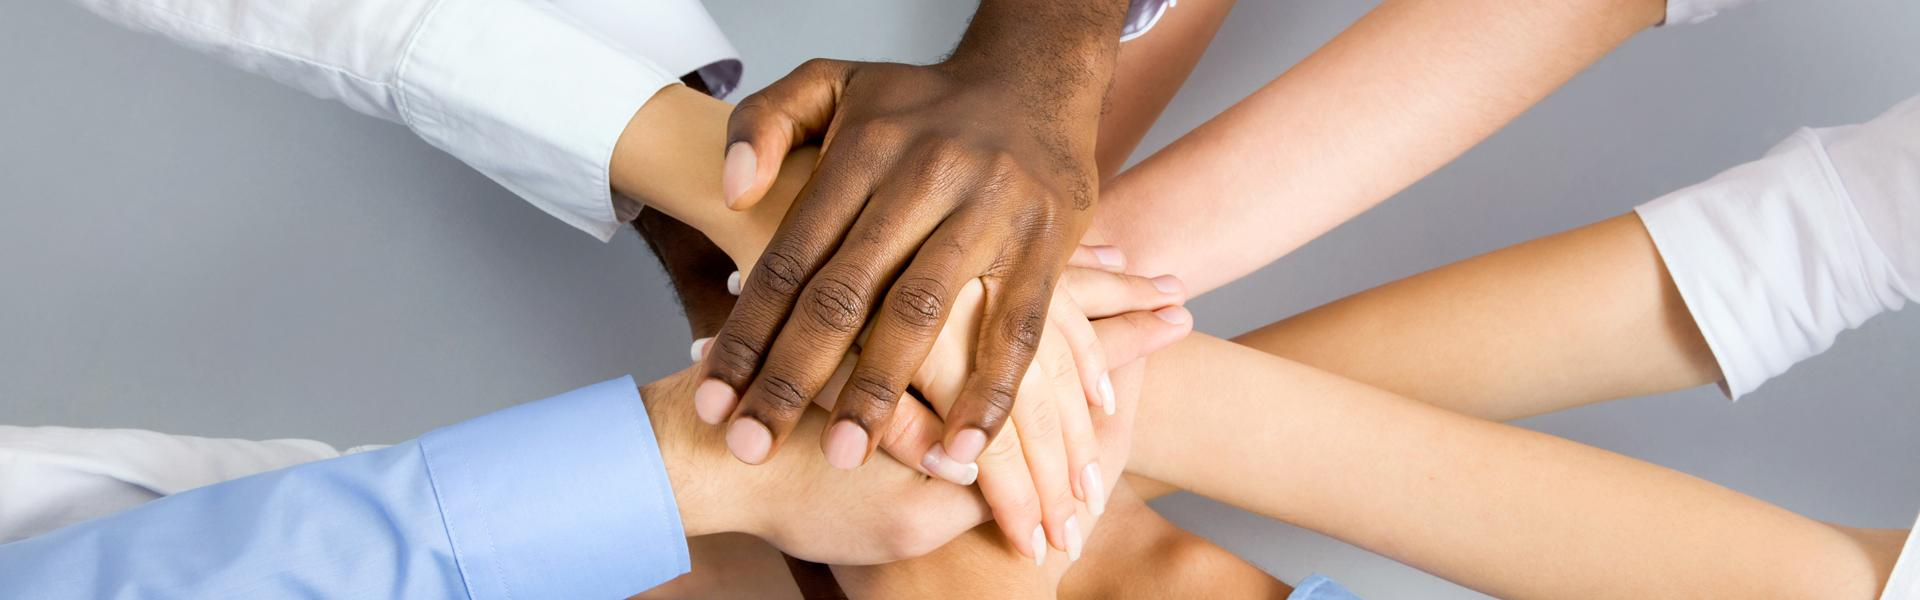 Diversitymanagement